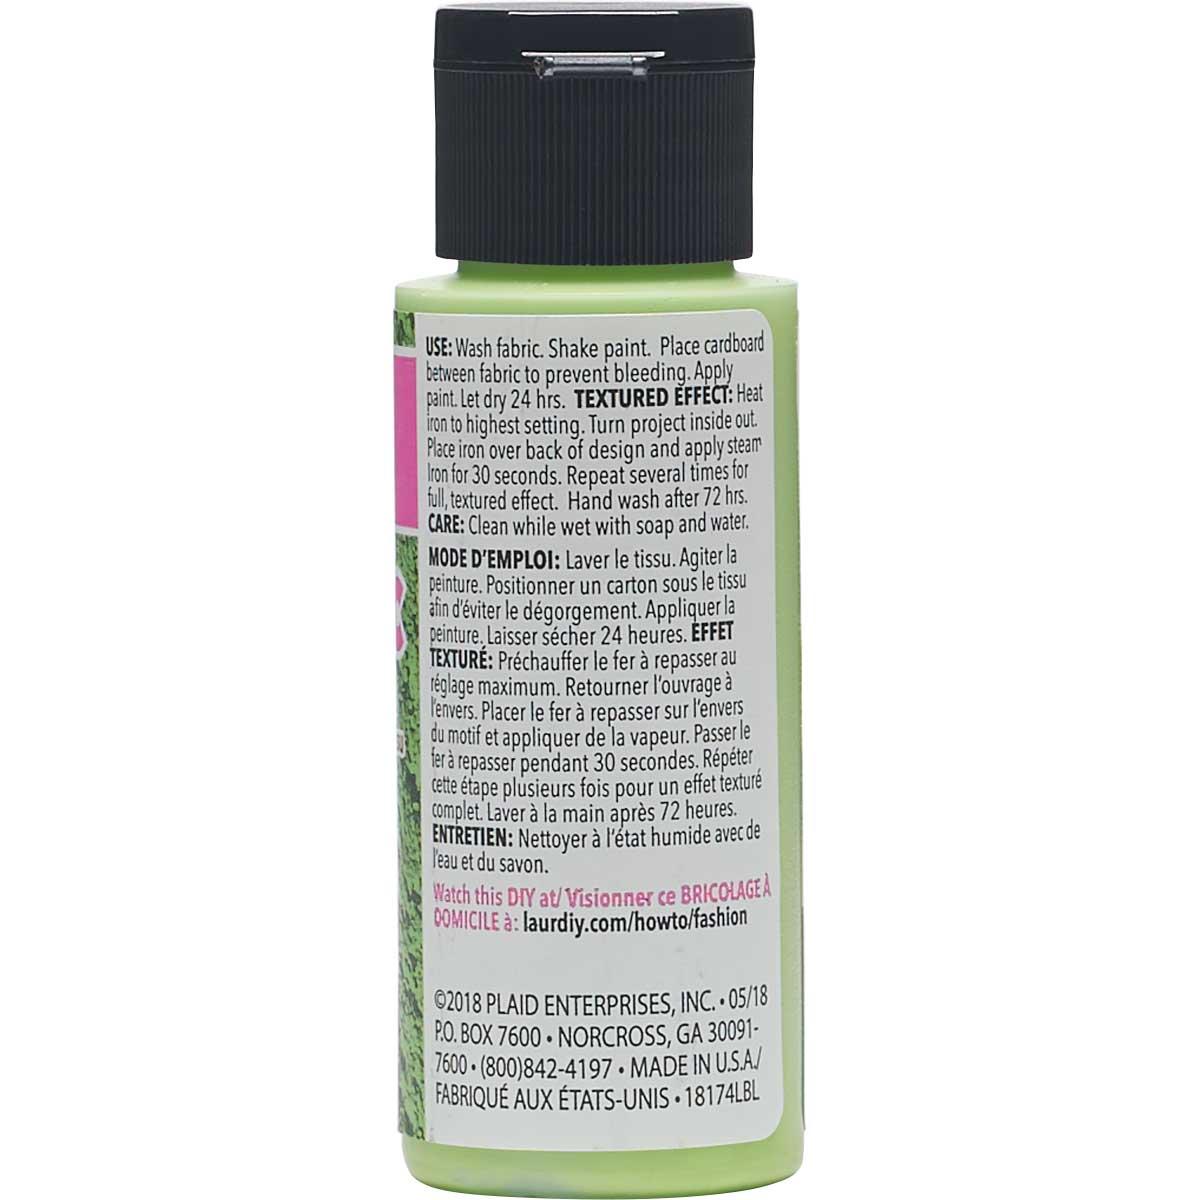 LaurDIY ® Texturific™ Fabric Paint - Palms, 2 oz.